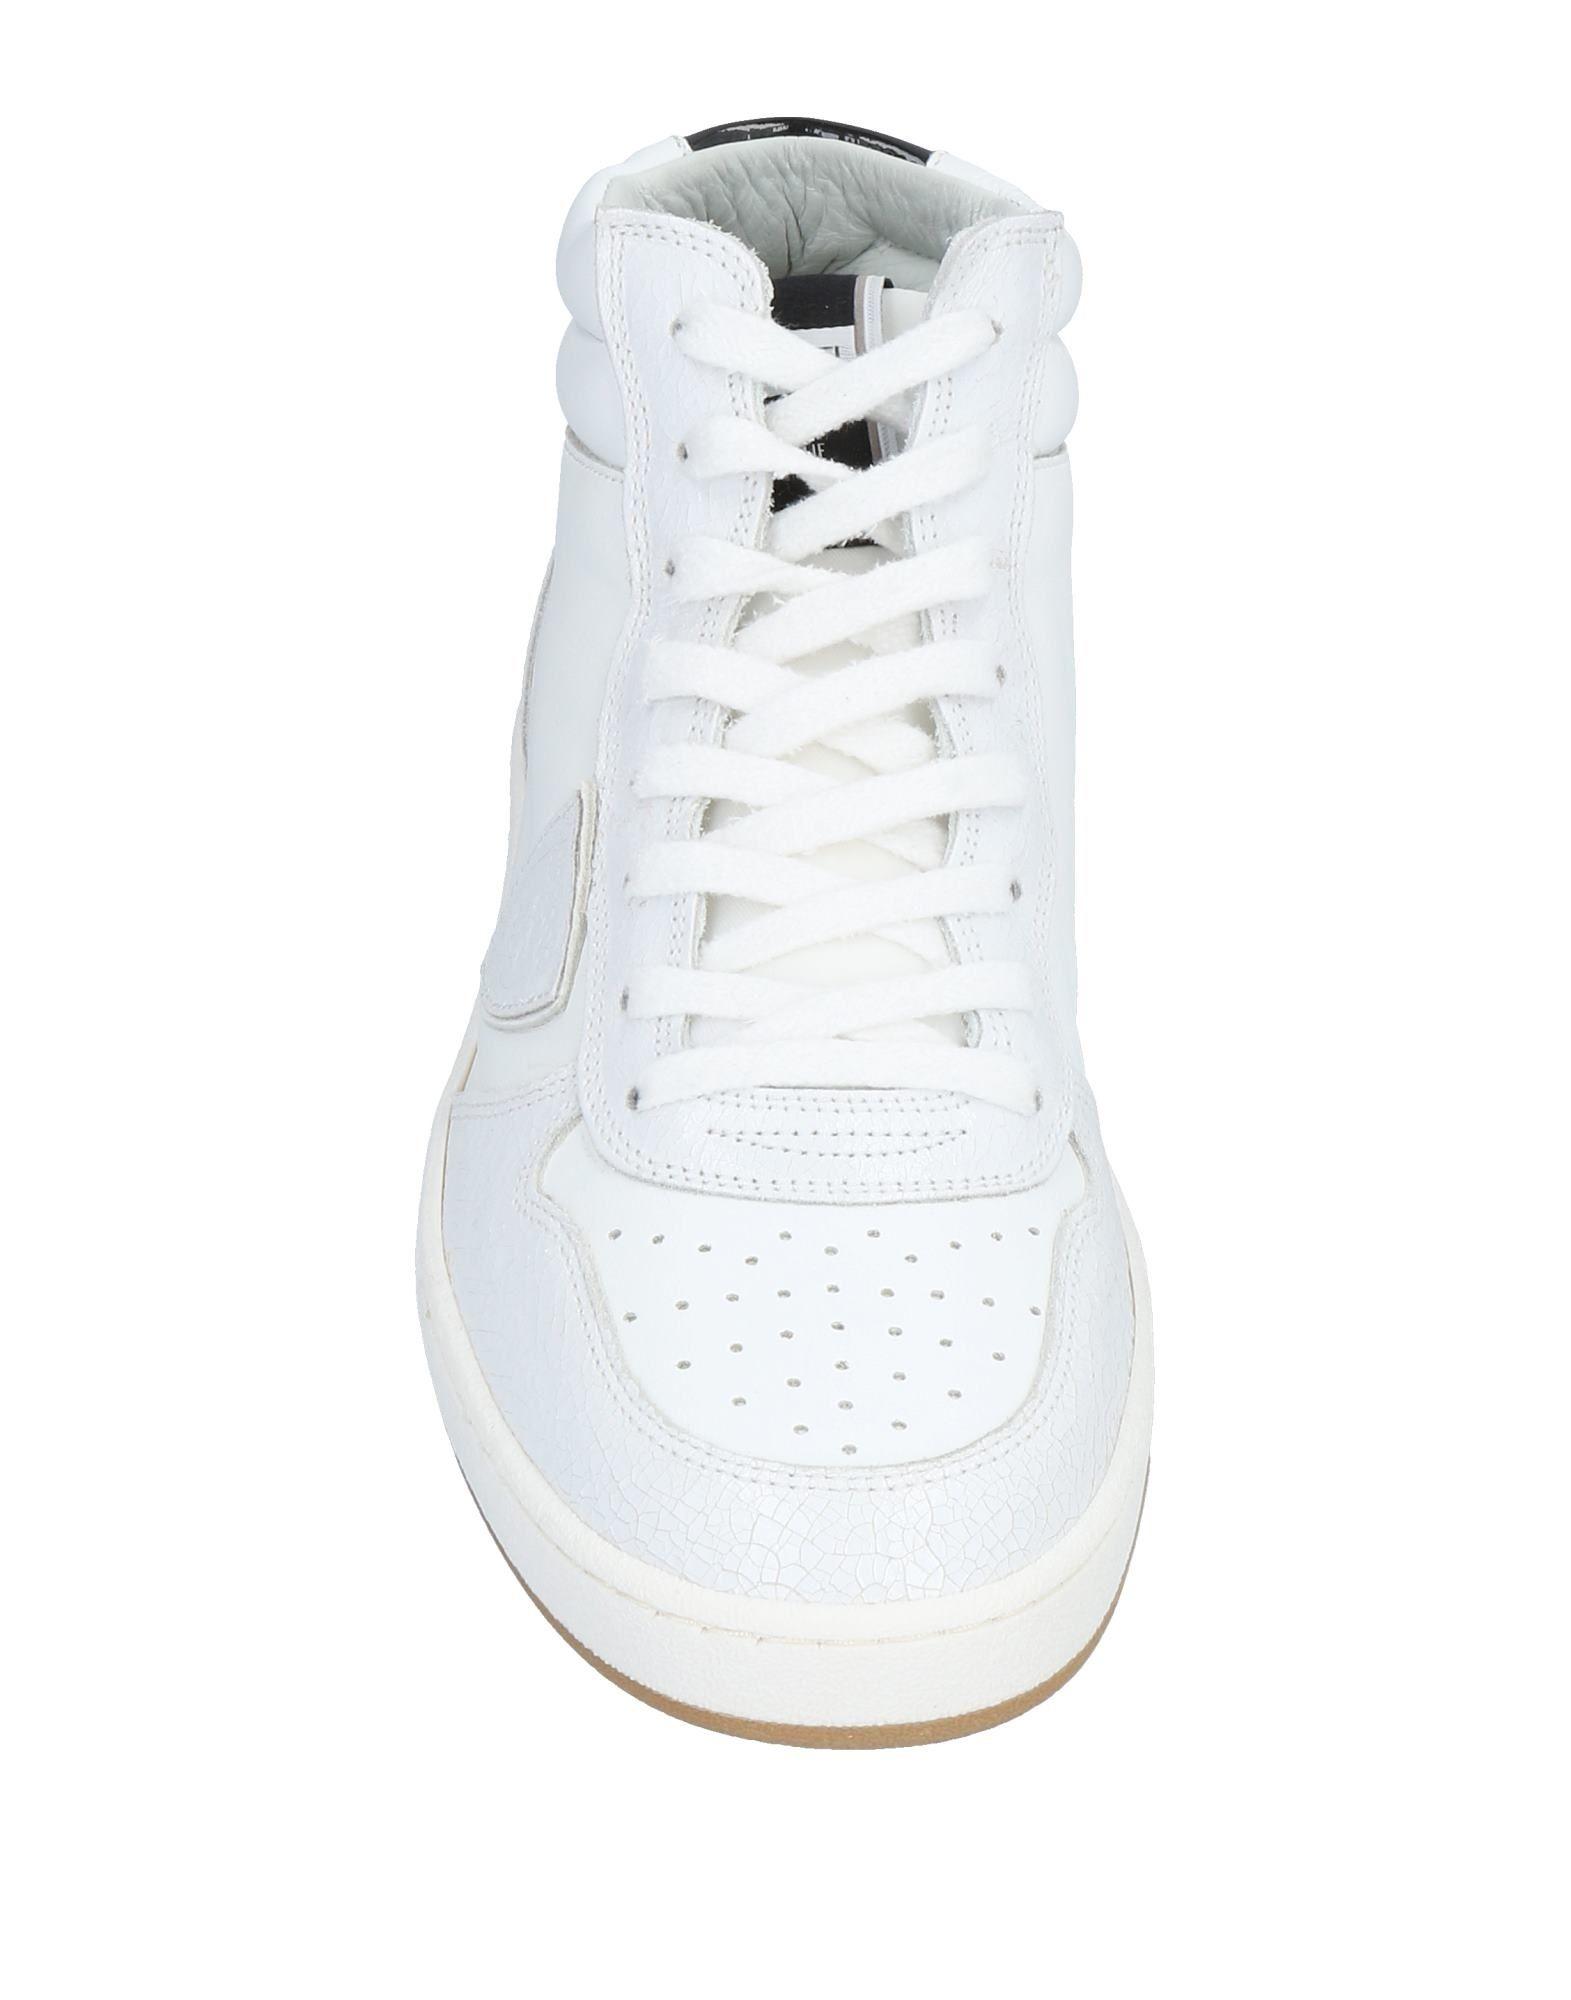 Philippe Model Sneakers Damen  11480963XFGut aussehende aussehende aussehende strapazierfähige Schuhe 77959d